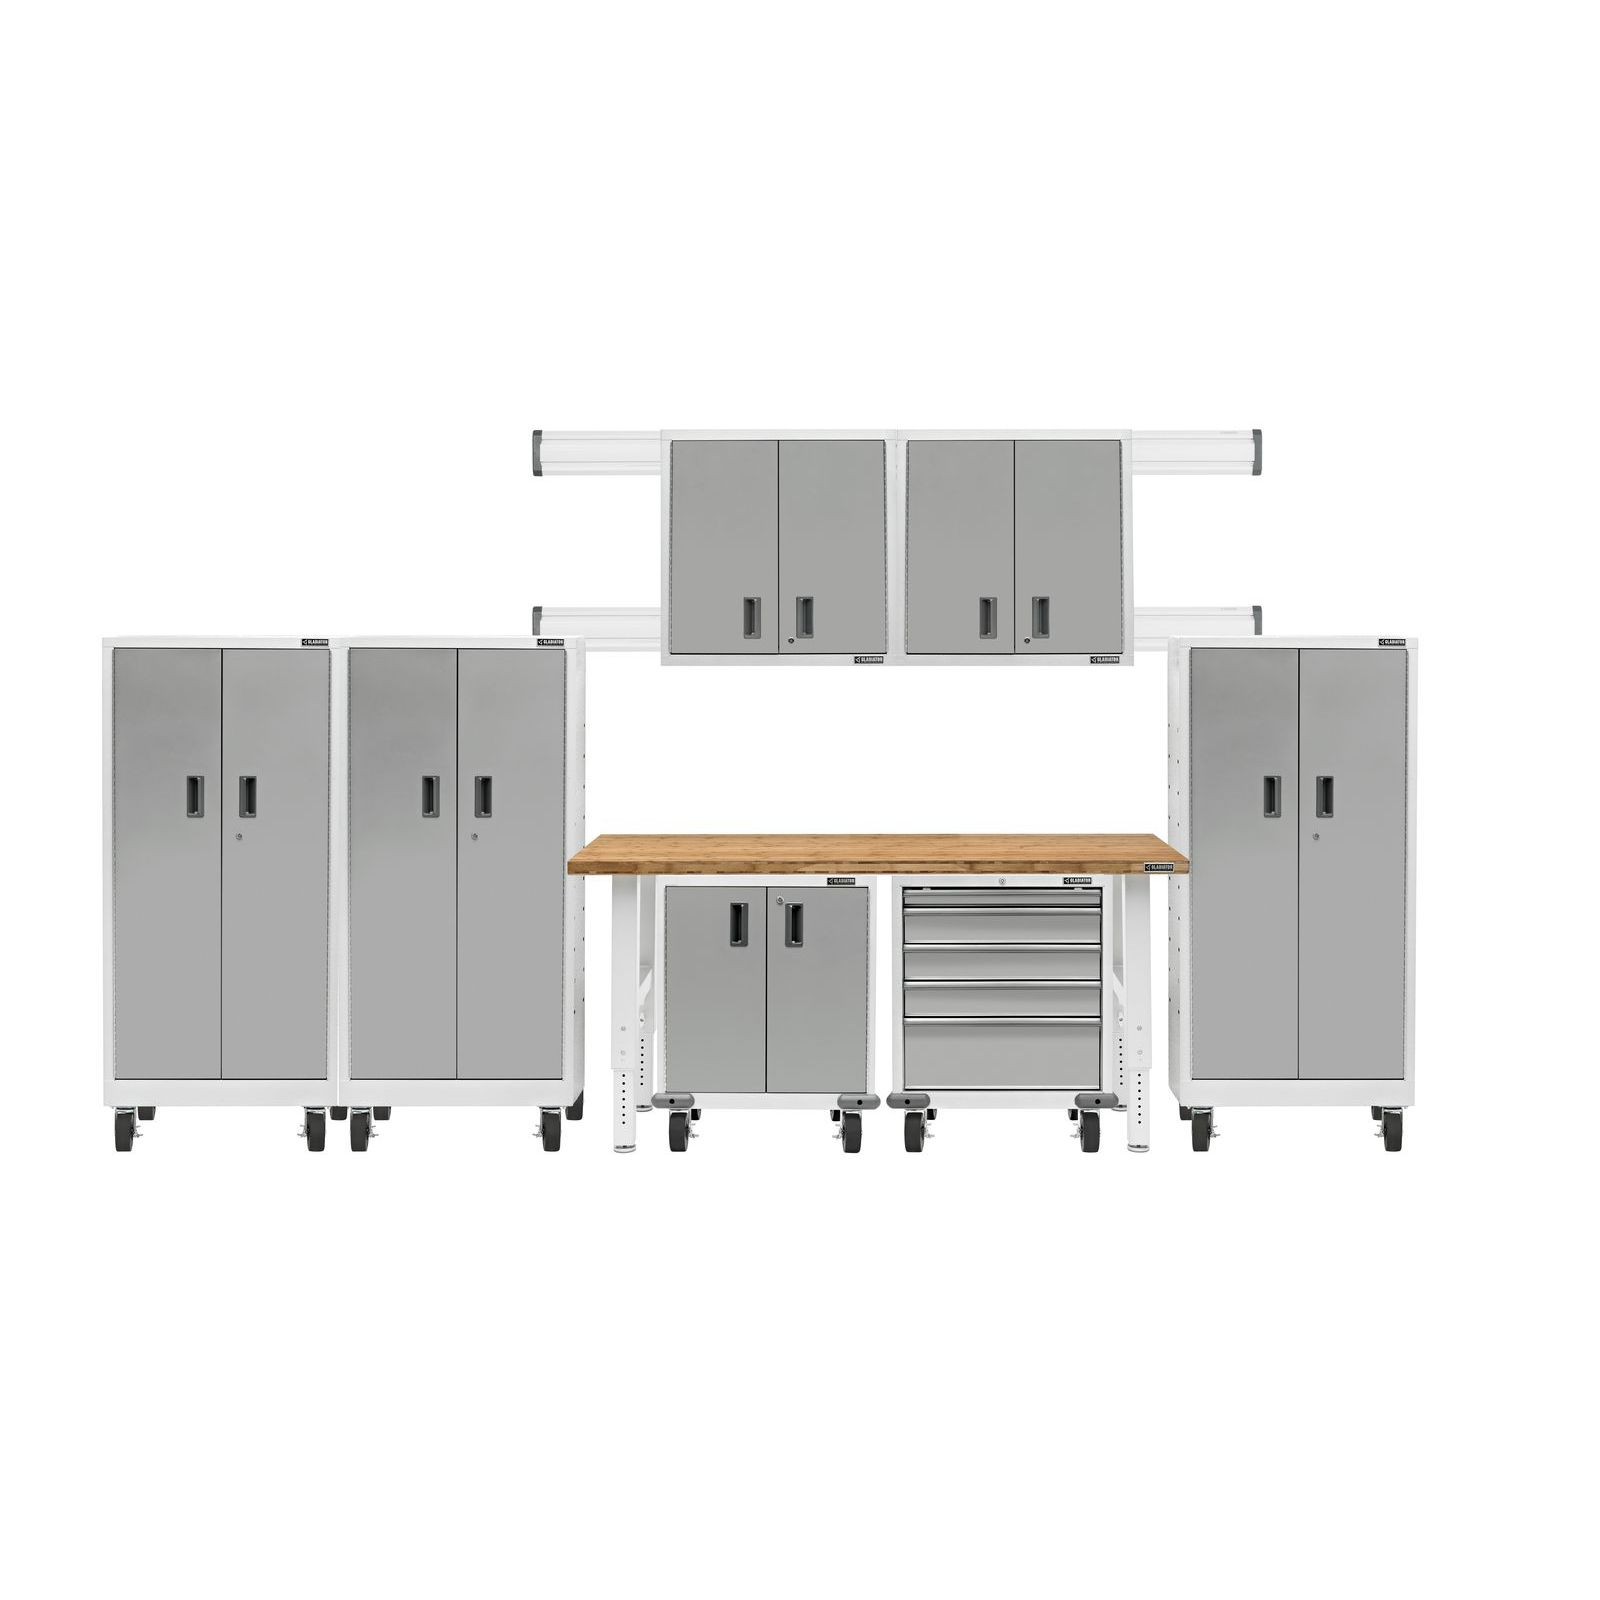 Gladiator Premier 8-Piece Garage Storage System GAPK06P5DW